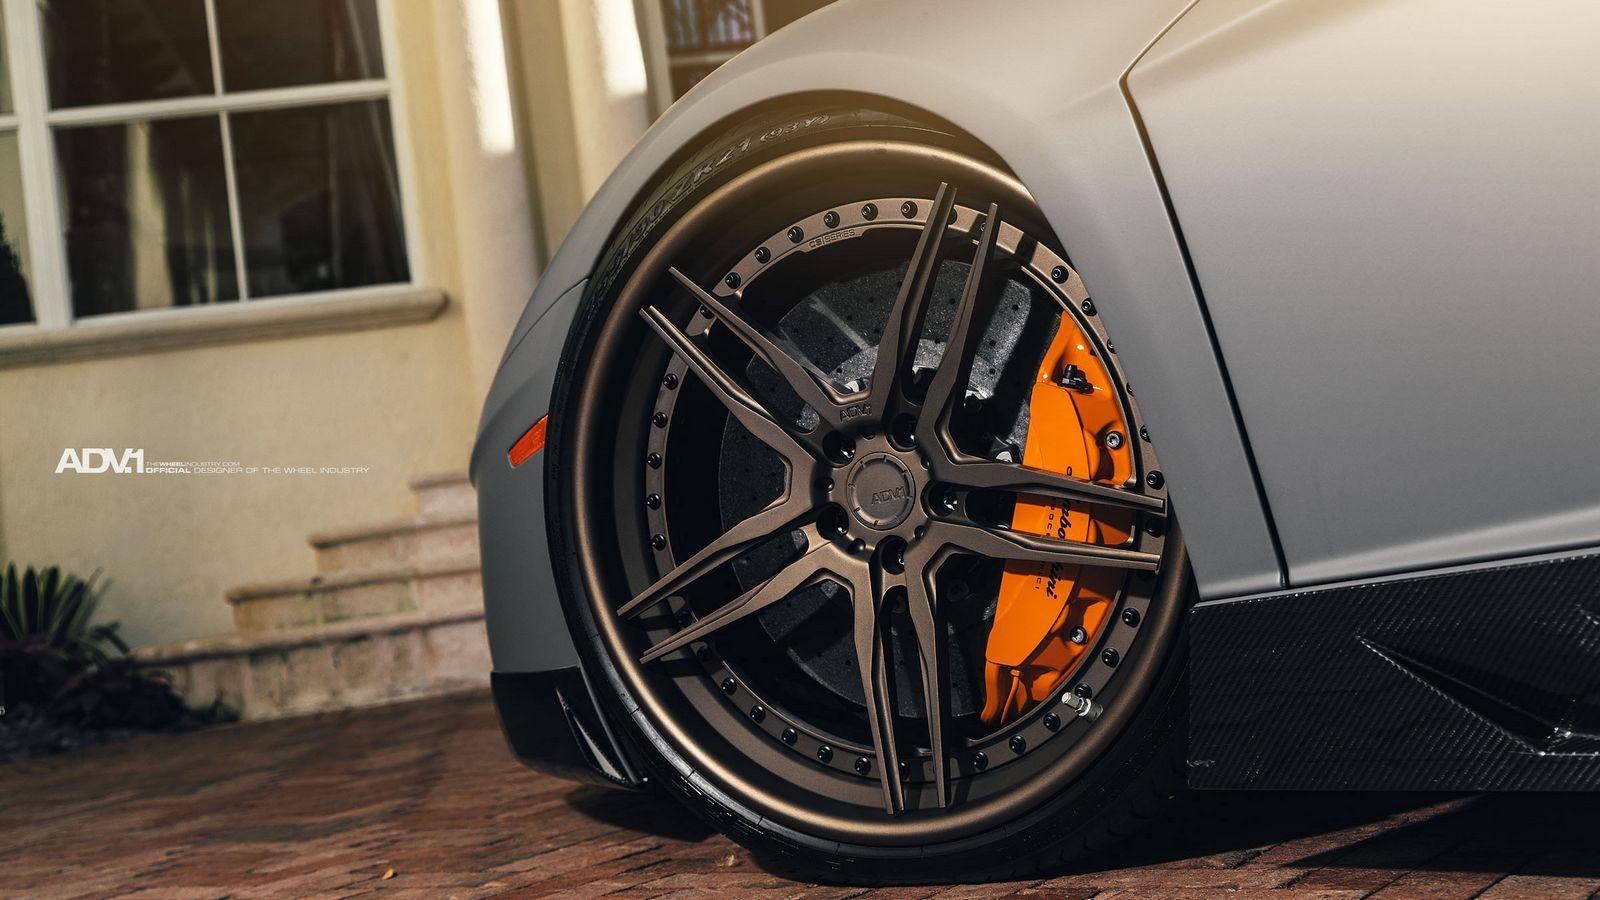 lamborghini-aventador-tuning-novitec-torado-adv1-wheels-8